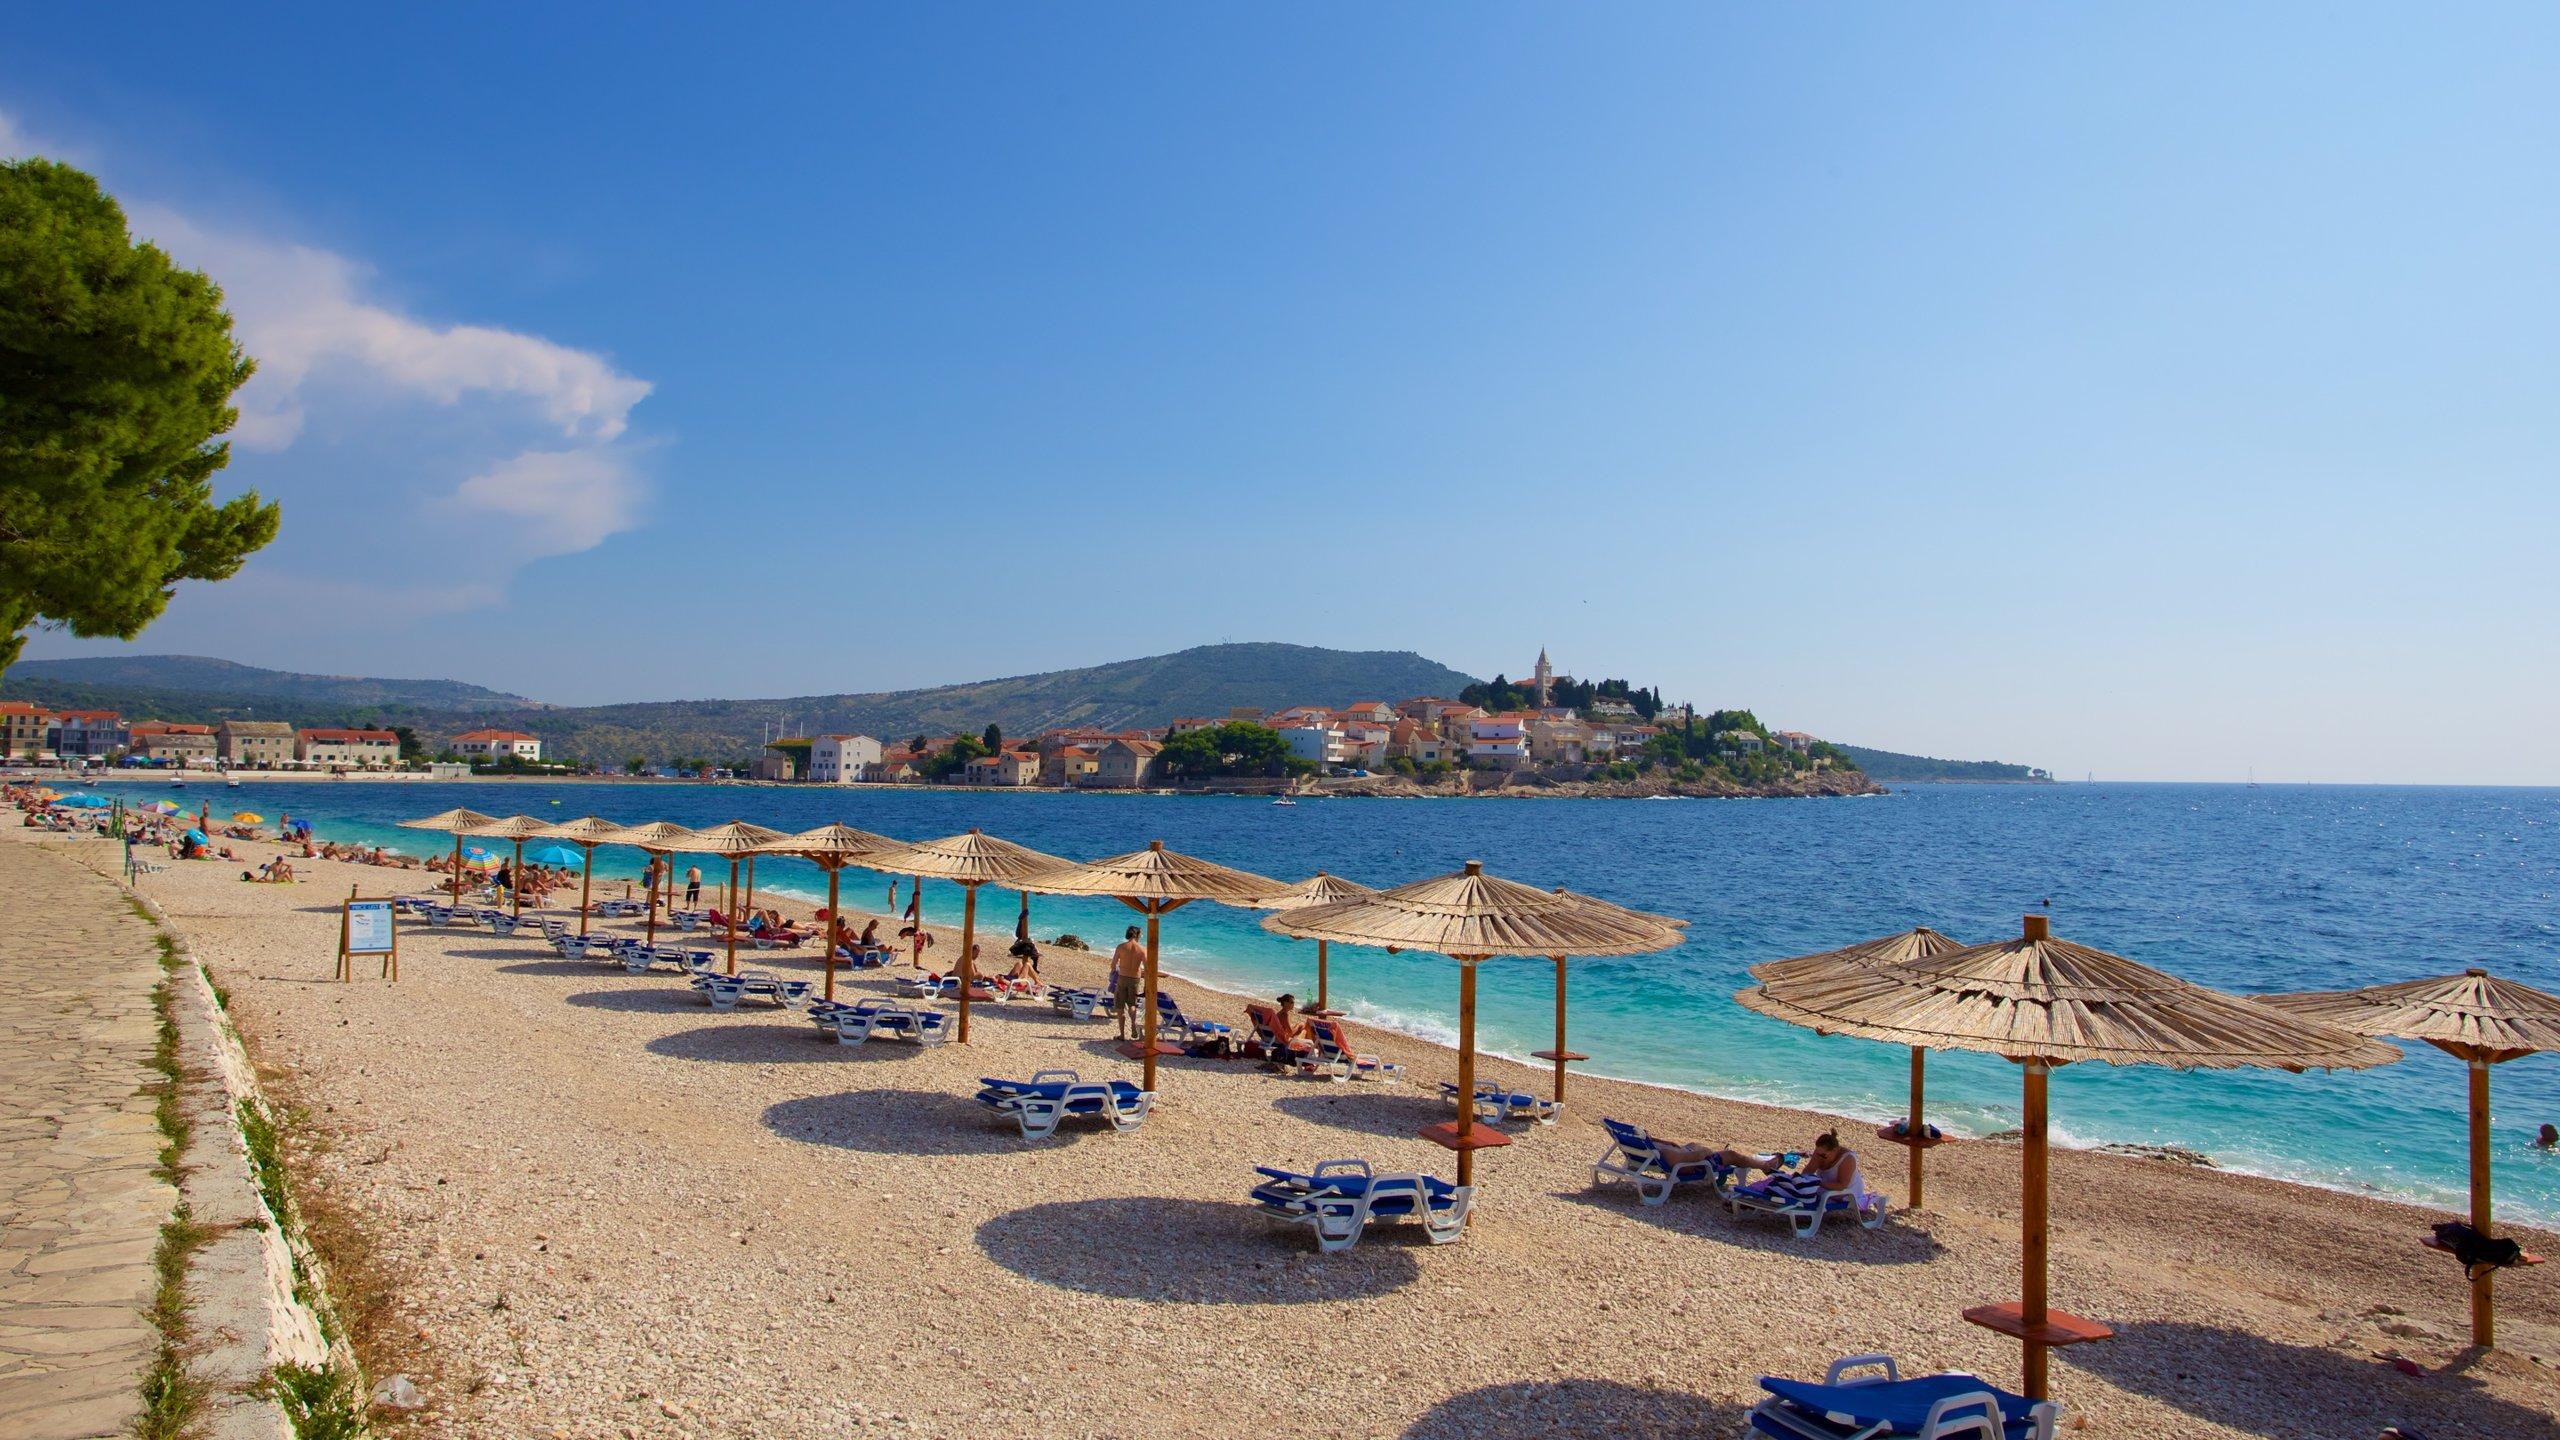 Primosten Beach, Primosten, Sibenik-Knin, Croatia